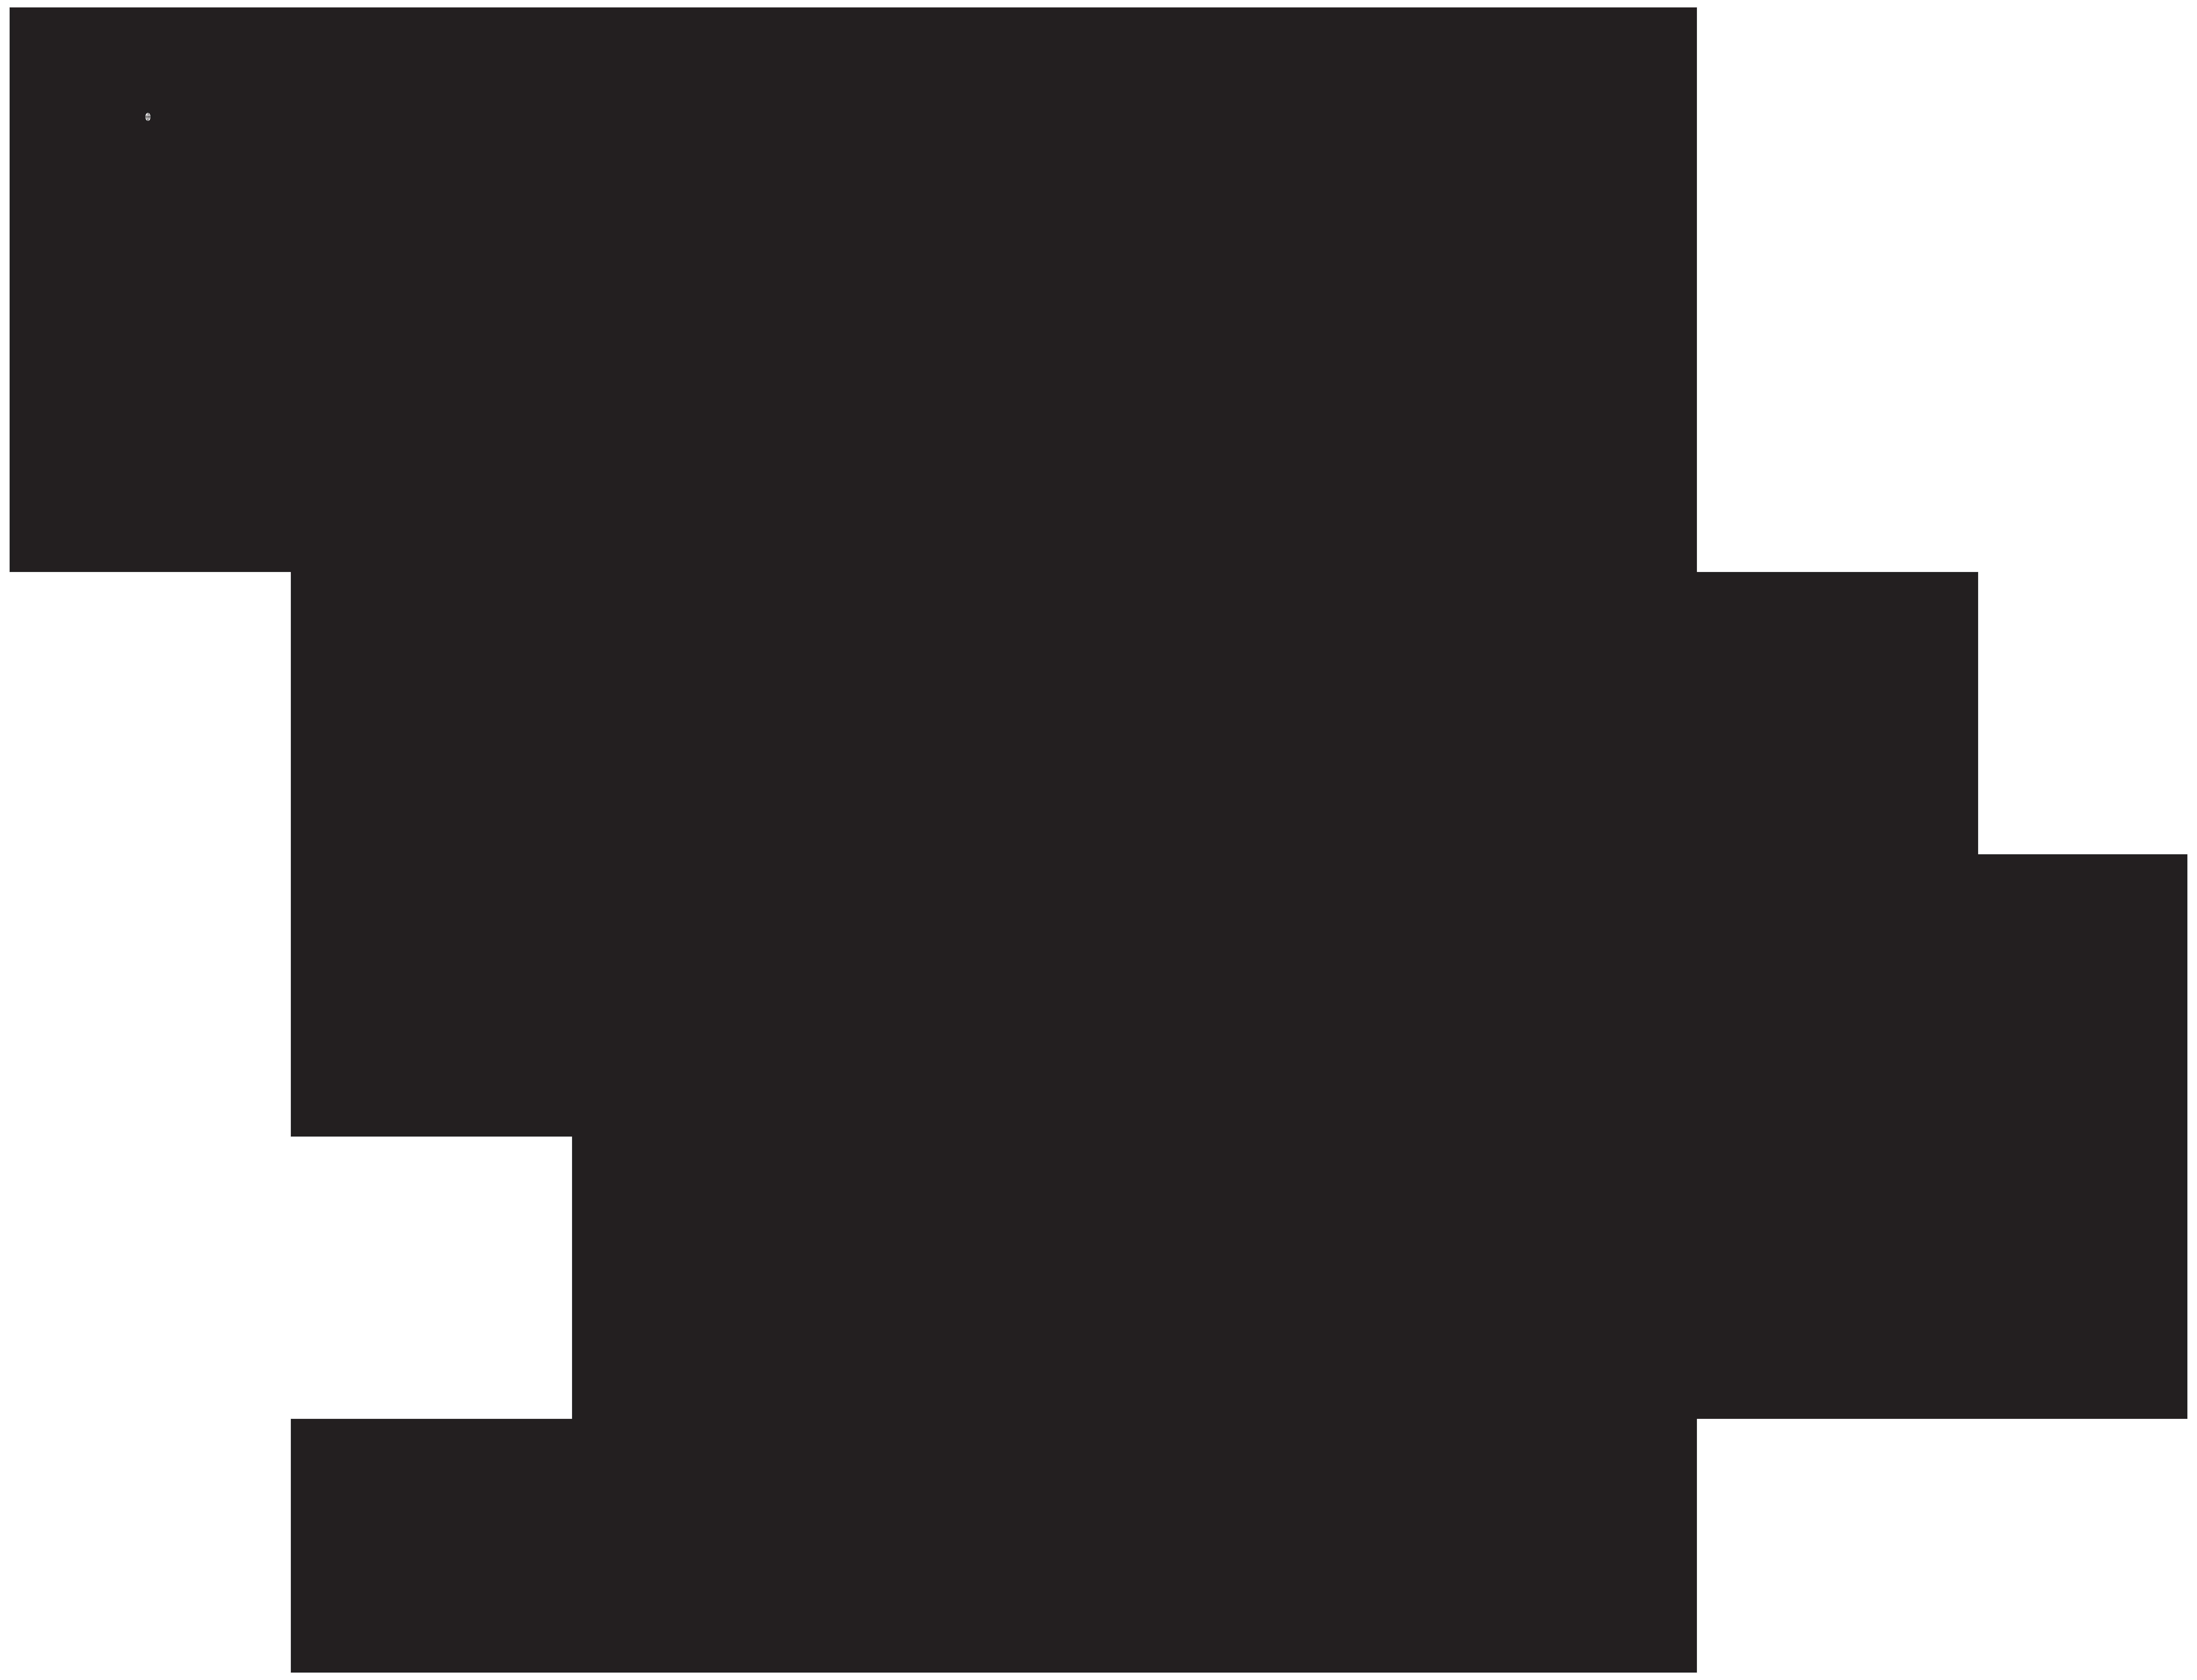 Pawprint clipart cheetah. Silhouette png transparent clip